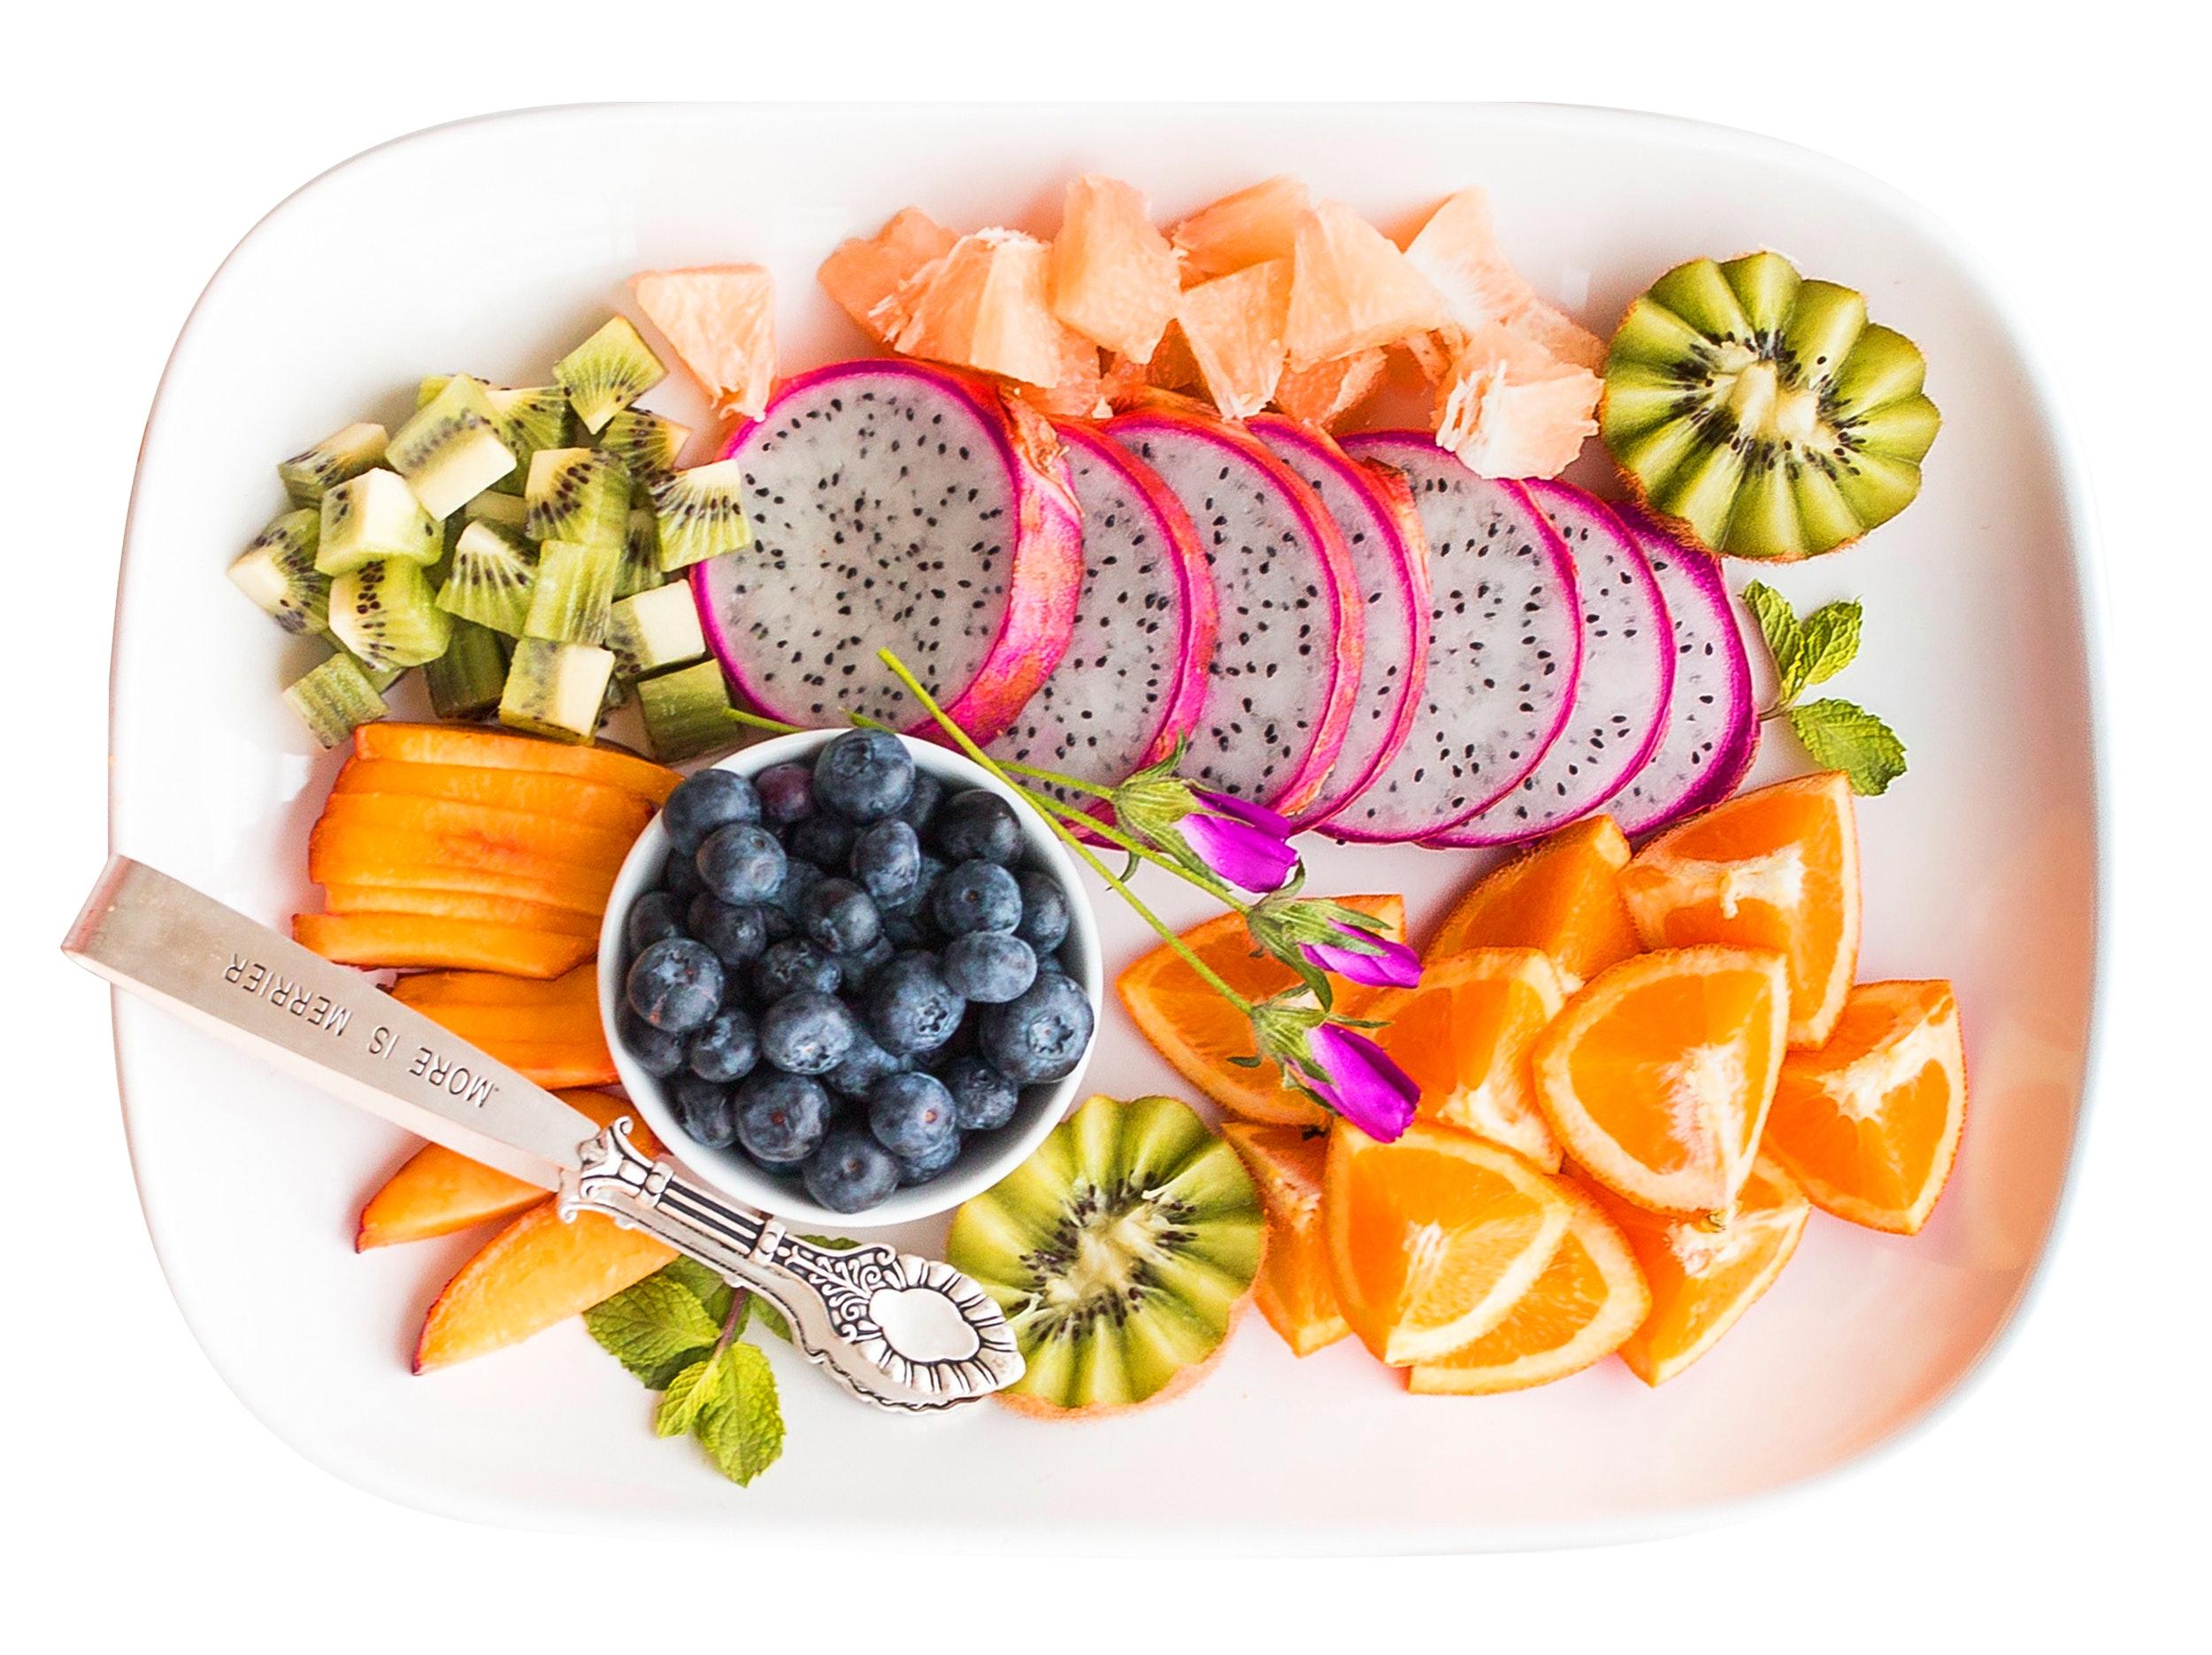 prajna-wellness-ayurveda-cooking-class-bc-abbotsford.jpg